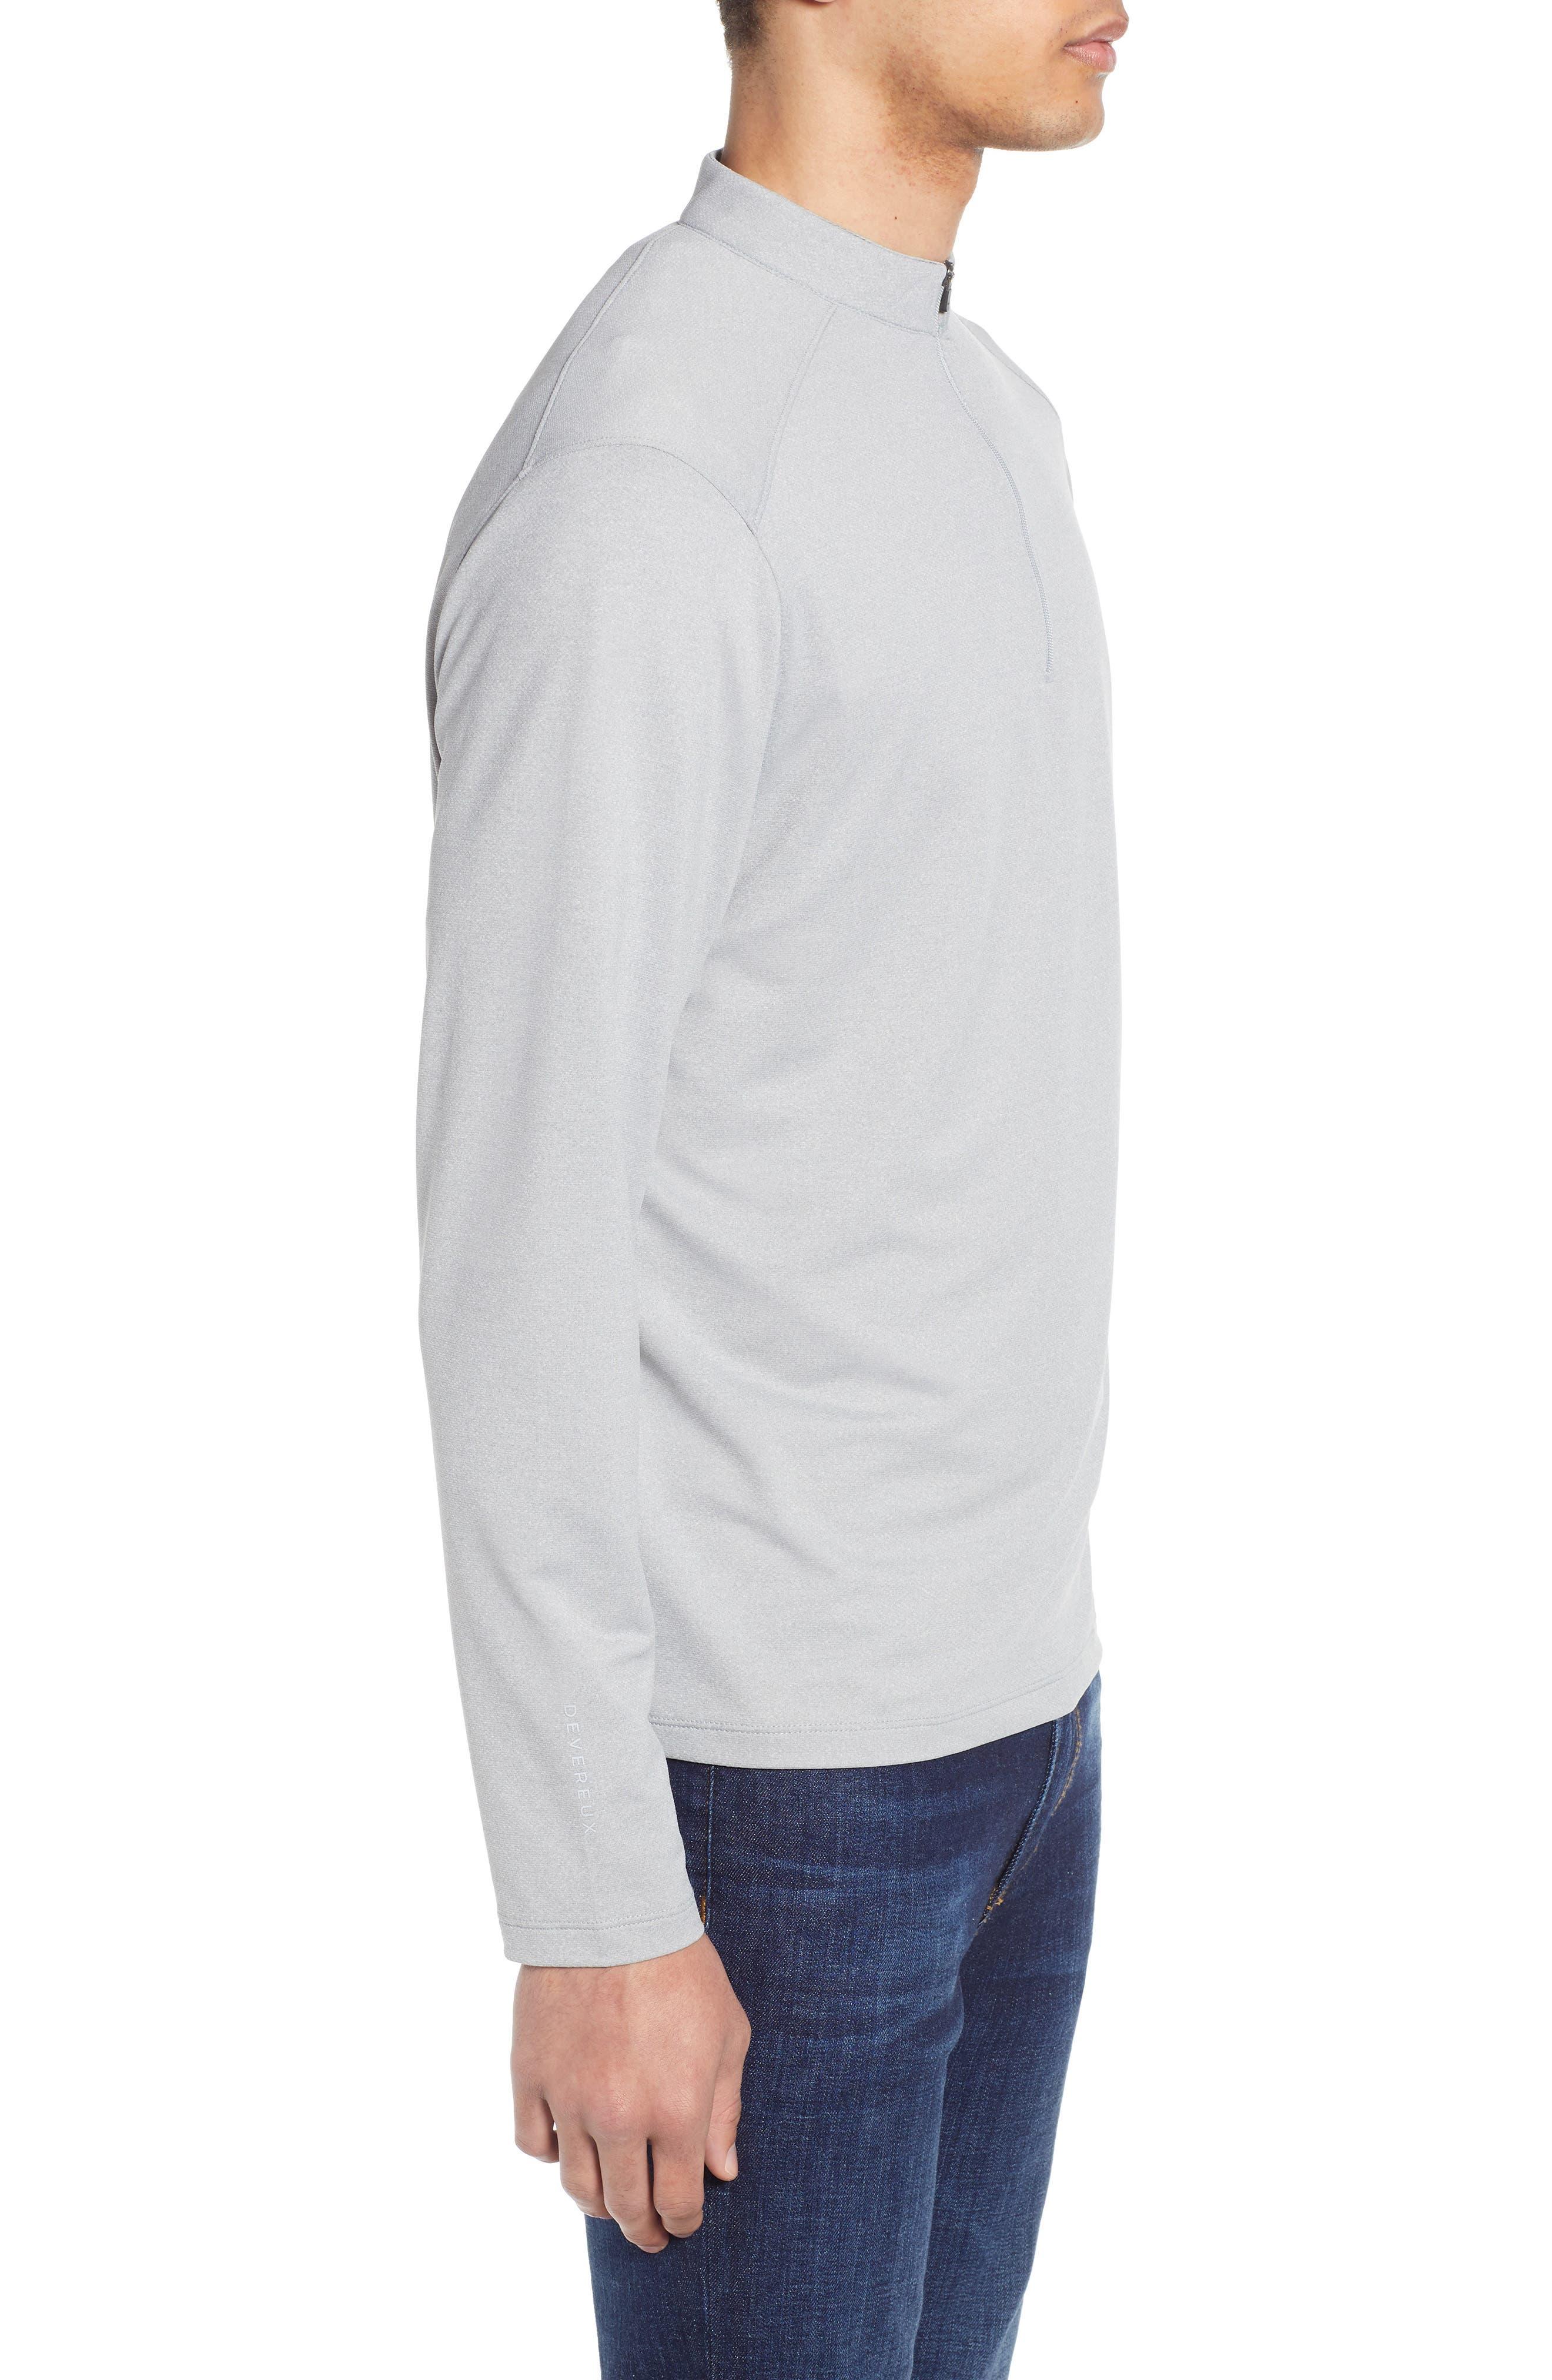 DEVEREUX, Lay-Low Half Zip Pullover, Alternate thumbnail 3, color, ASPHALT